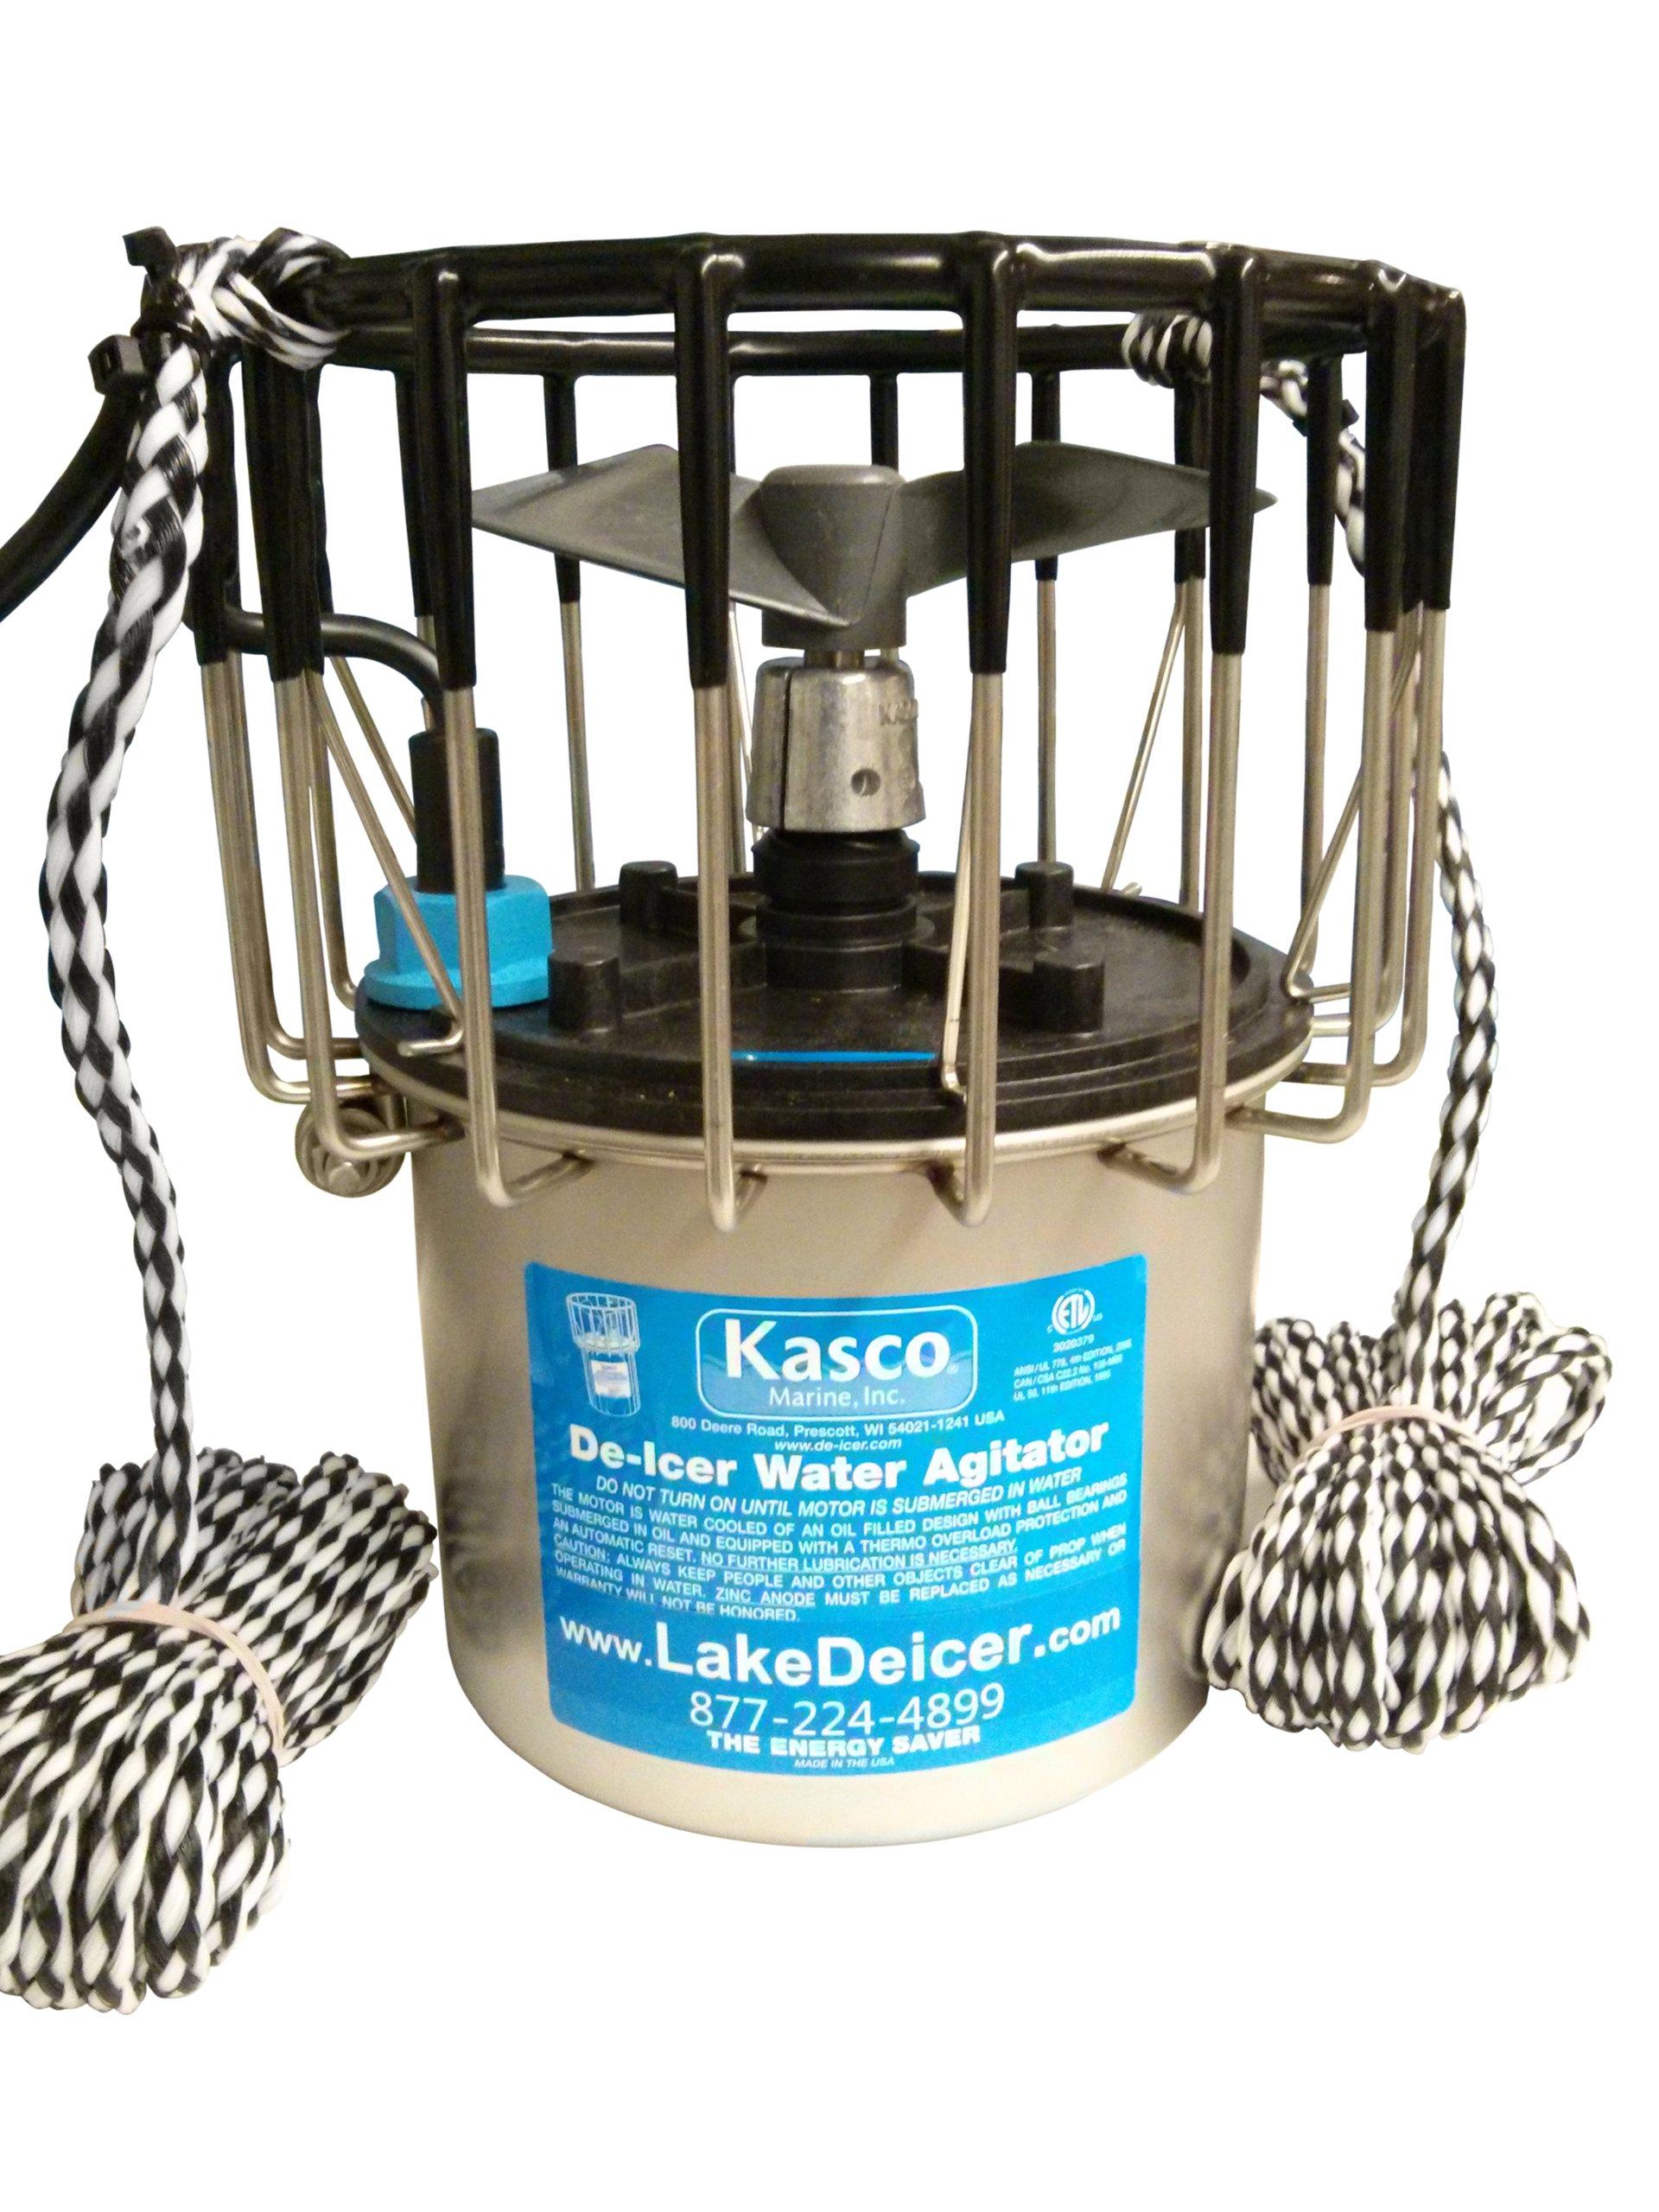 Kasco Marine De-Icer 1/2hp 120 volts Pond Lake Dock Deicer 2400D025 (w/ 100 ft Power Cord)